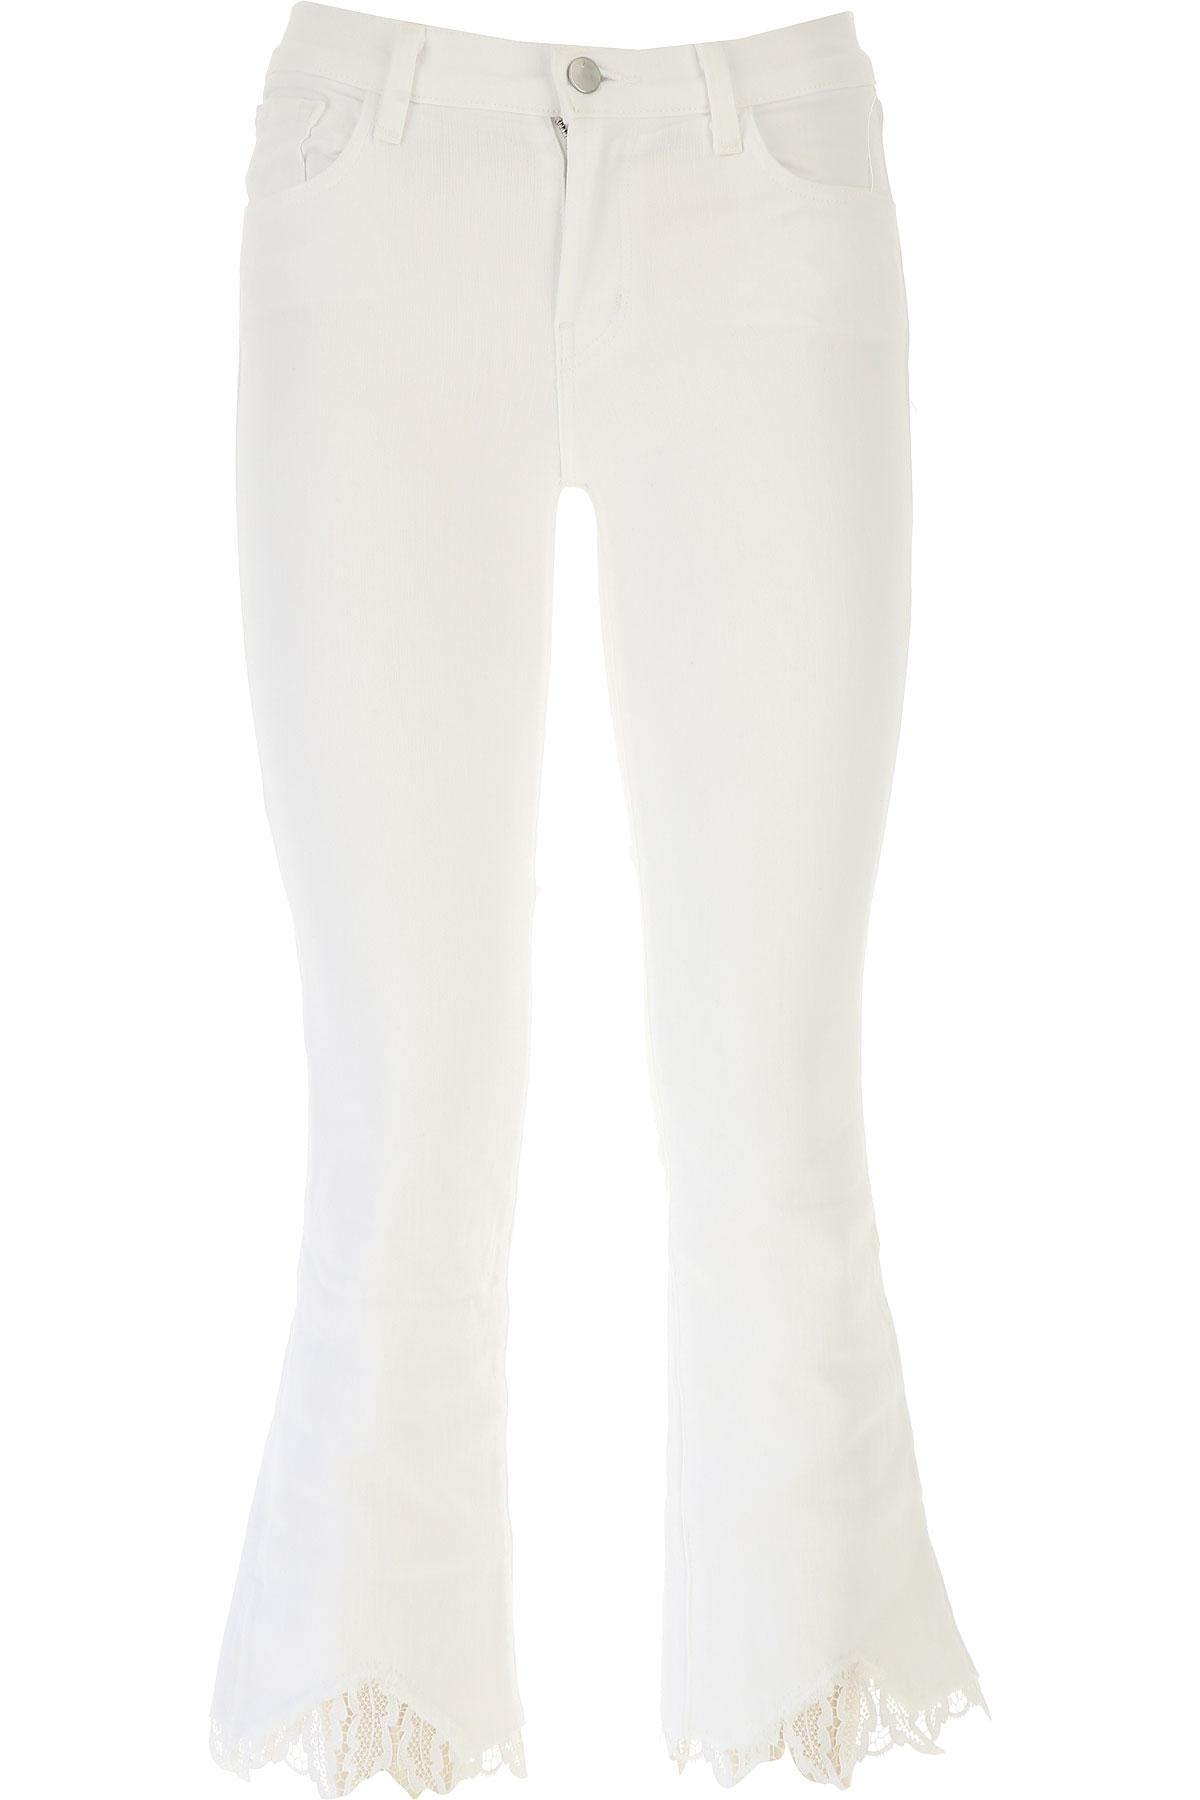 J Brand Jeans On Sale, White, Cotton, 2019, 26 30